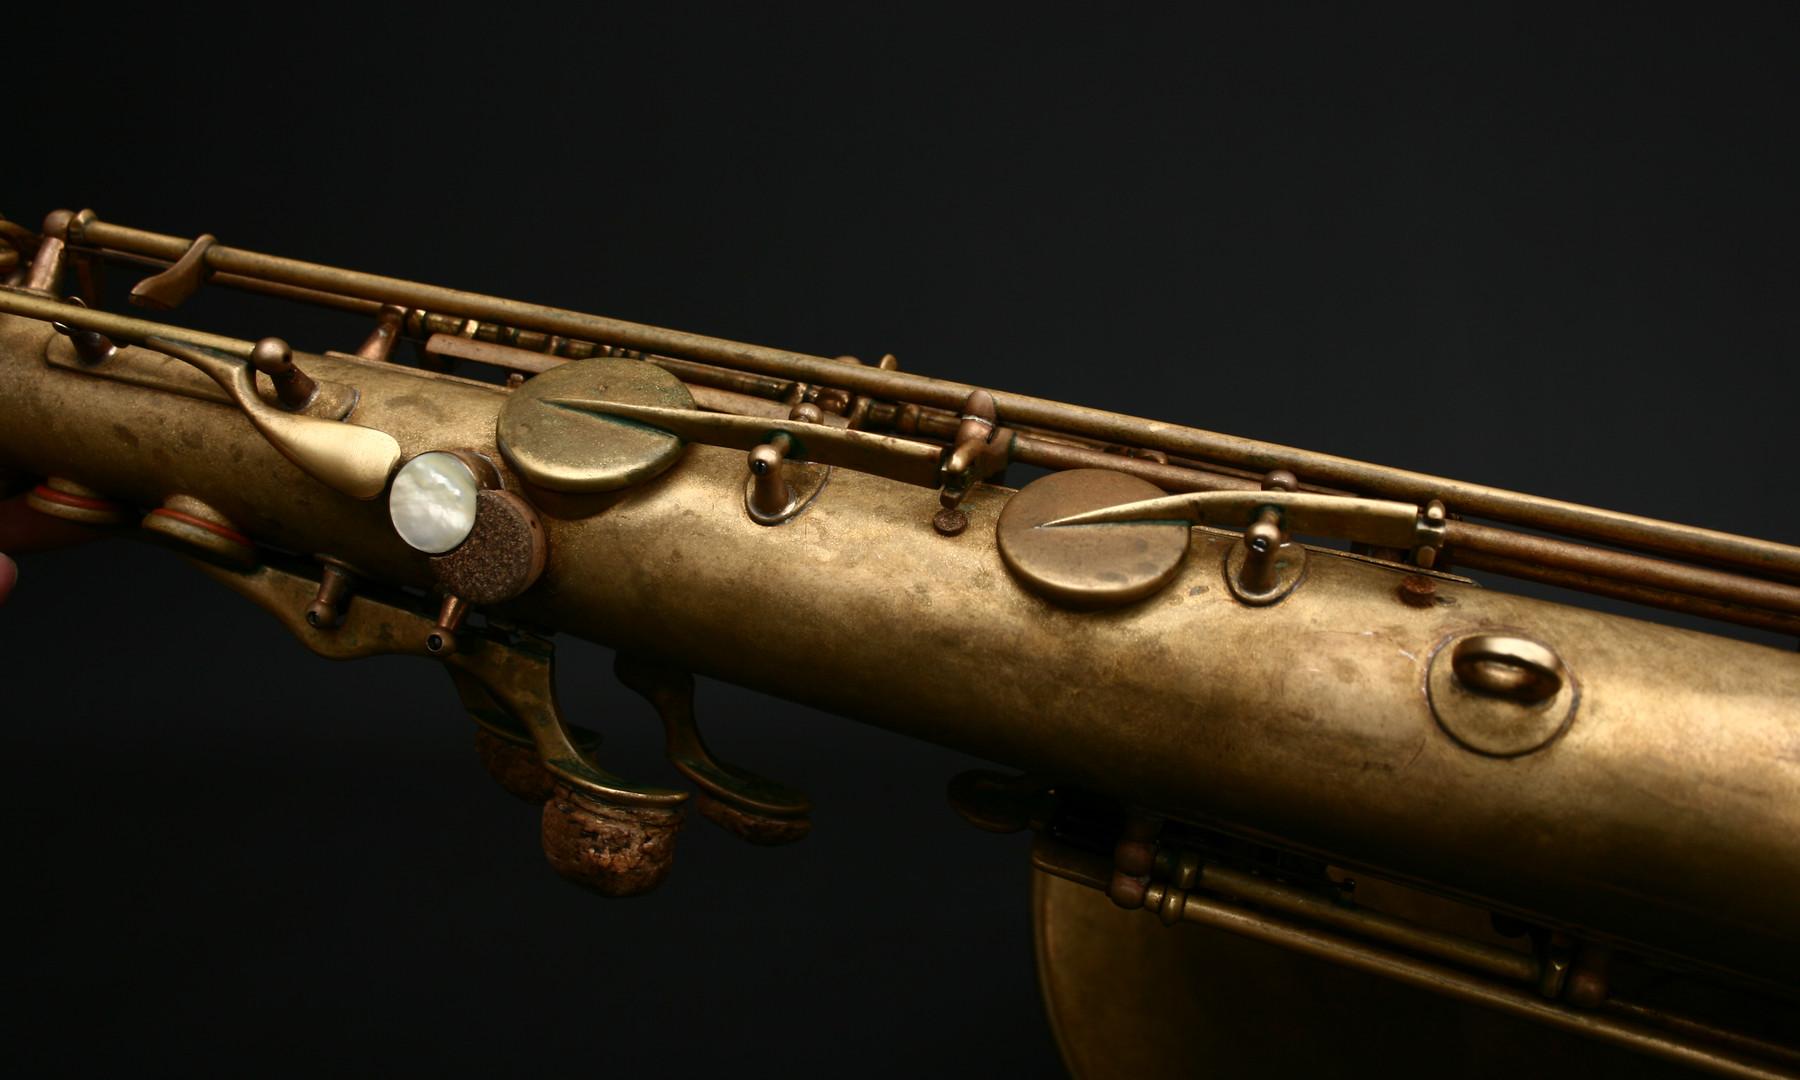 Tenorsaxophon Selmer New Large Bore - Saxophon Manufaktur Marx